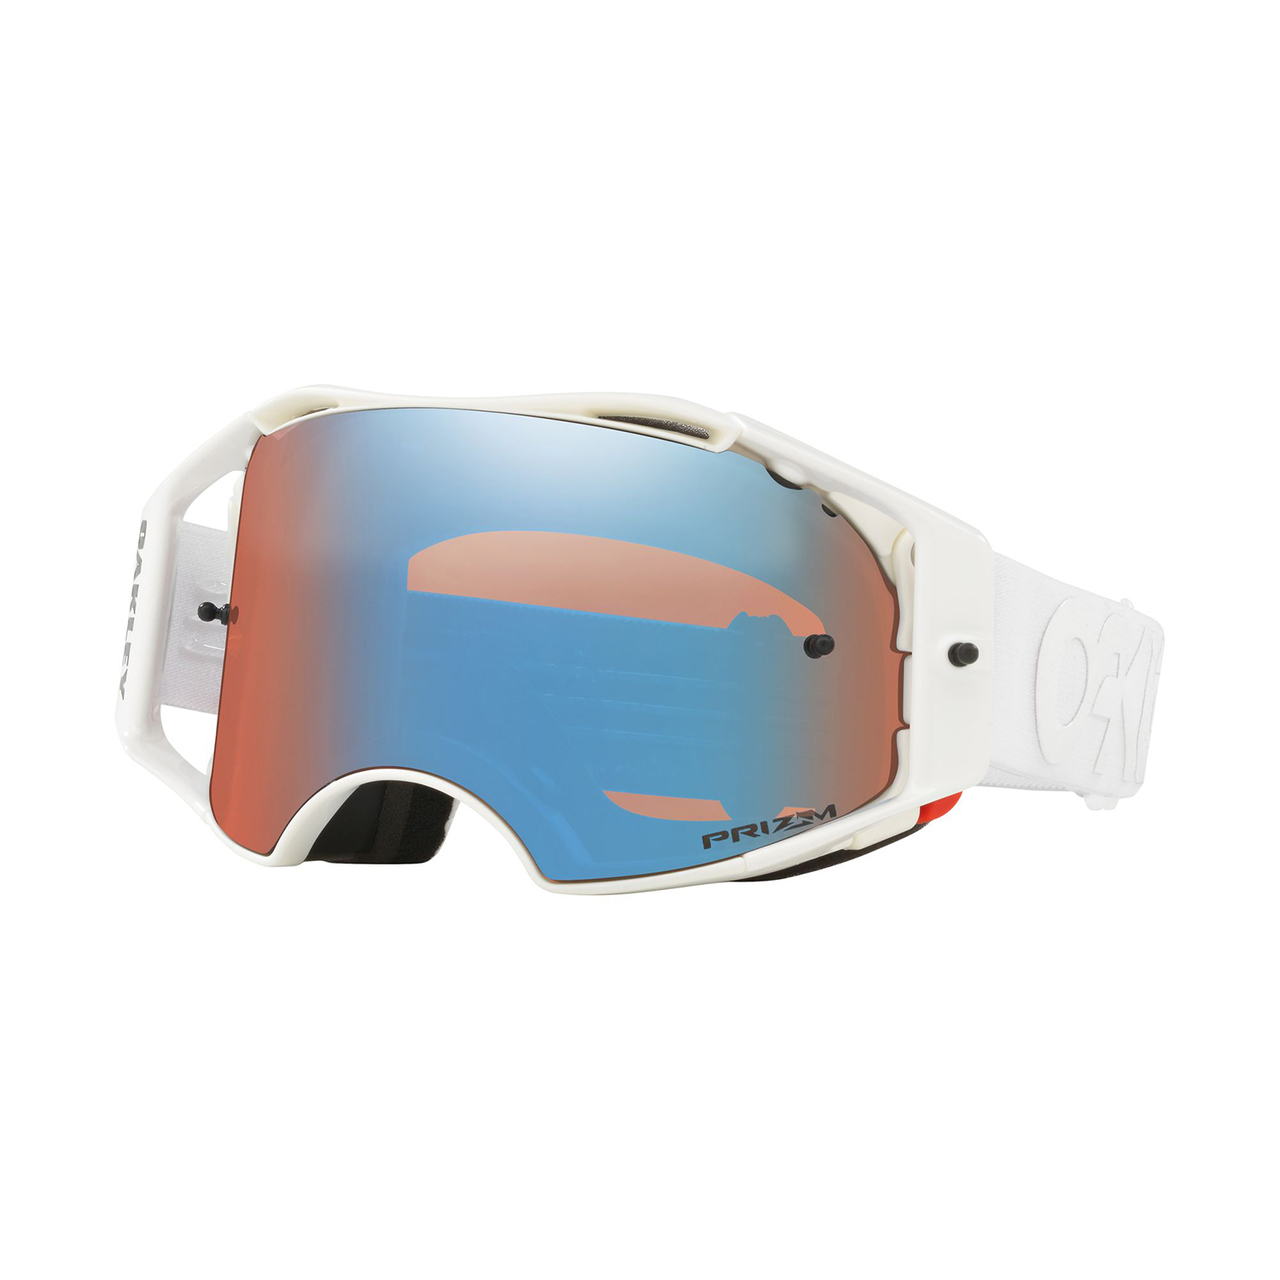 Oakley Airbrake Mx >> Oakley Airbrake Factory Pilot Collection MX Goggle (Whiteout) Prizm Sapphire Iridum Lens – FRP ...